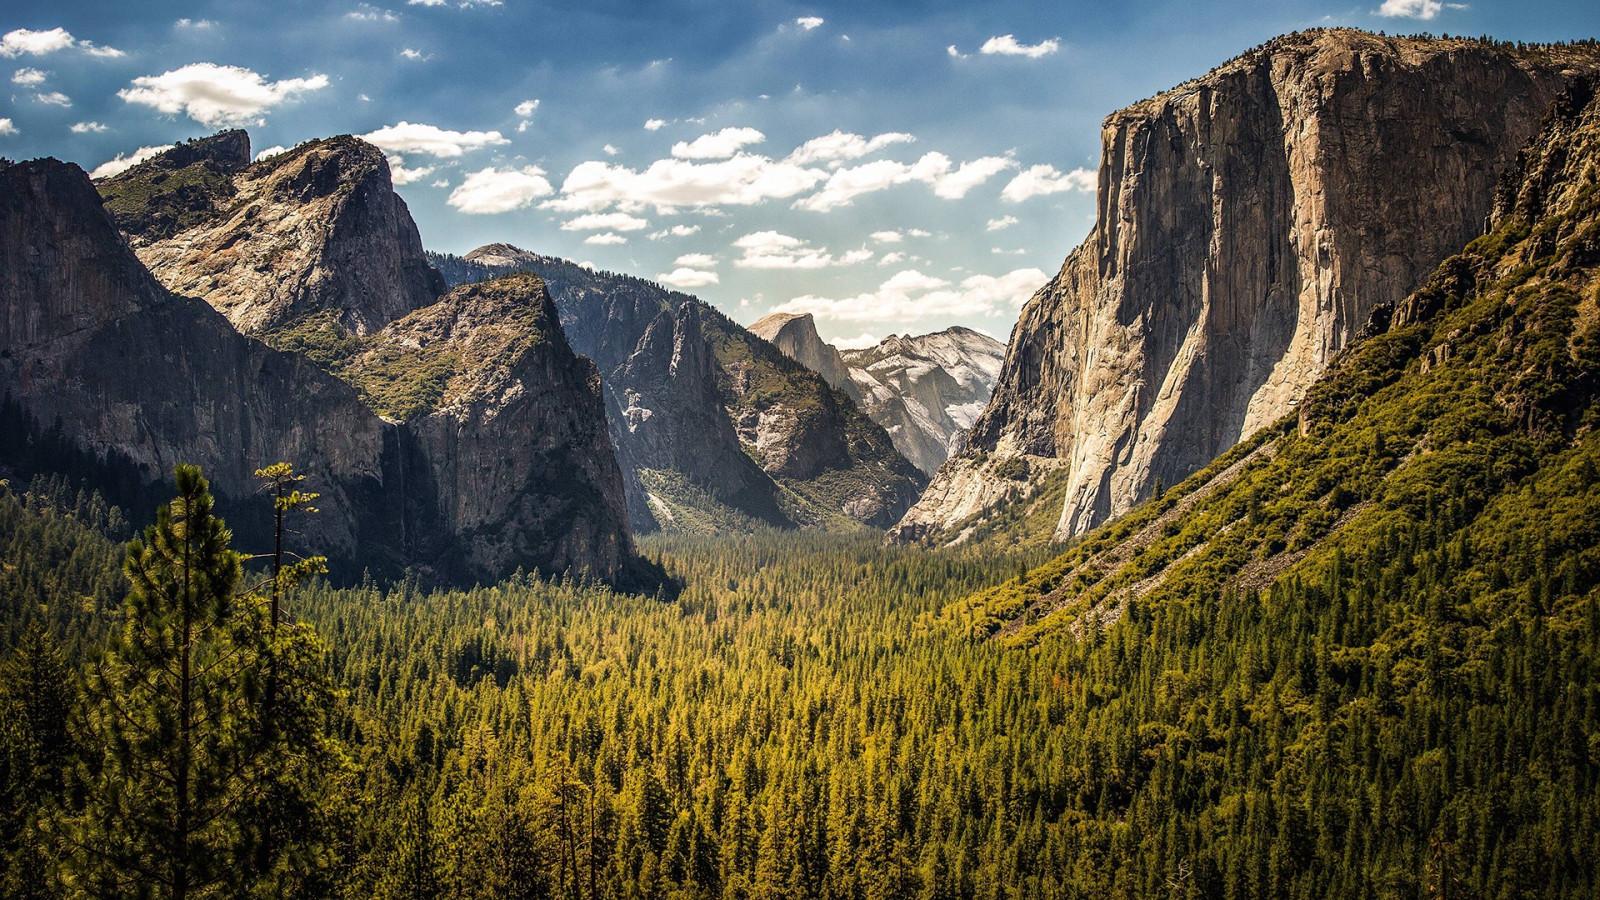 Wallpaper : trees, landscape, hill, rock, sky, clouds, cliff